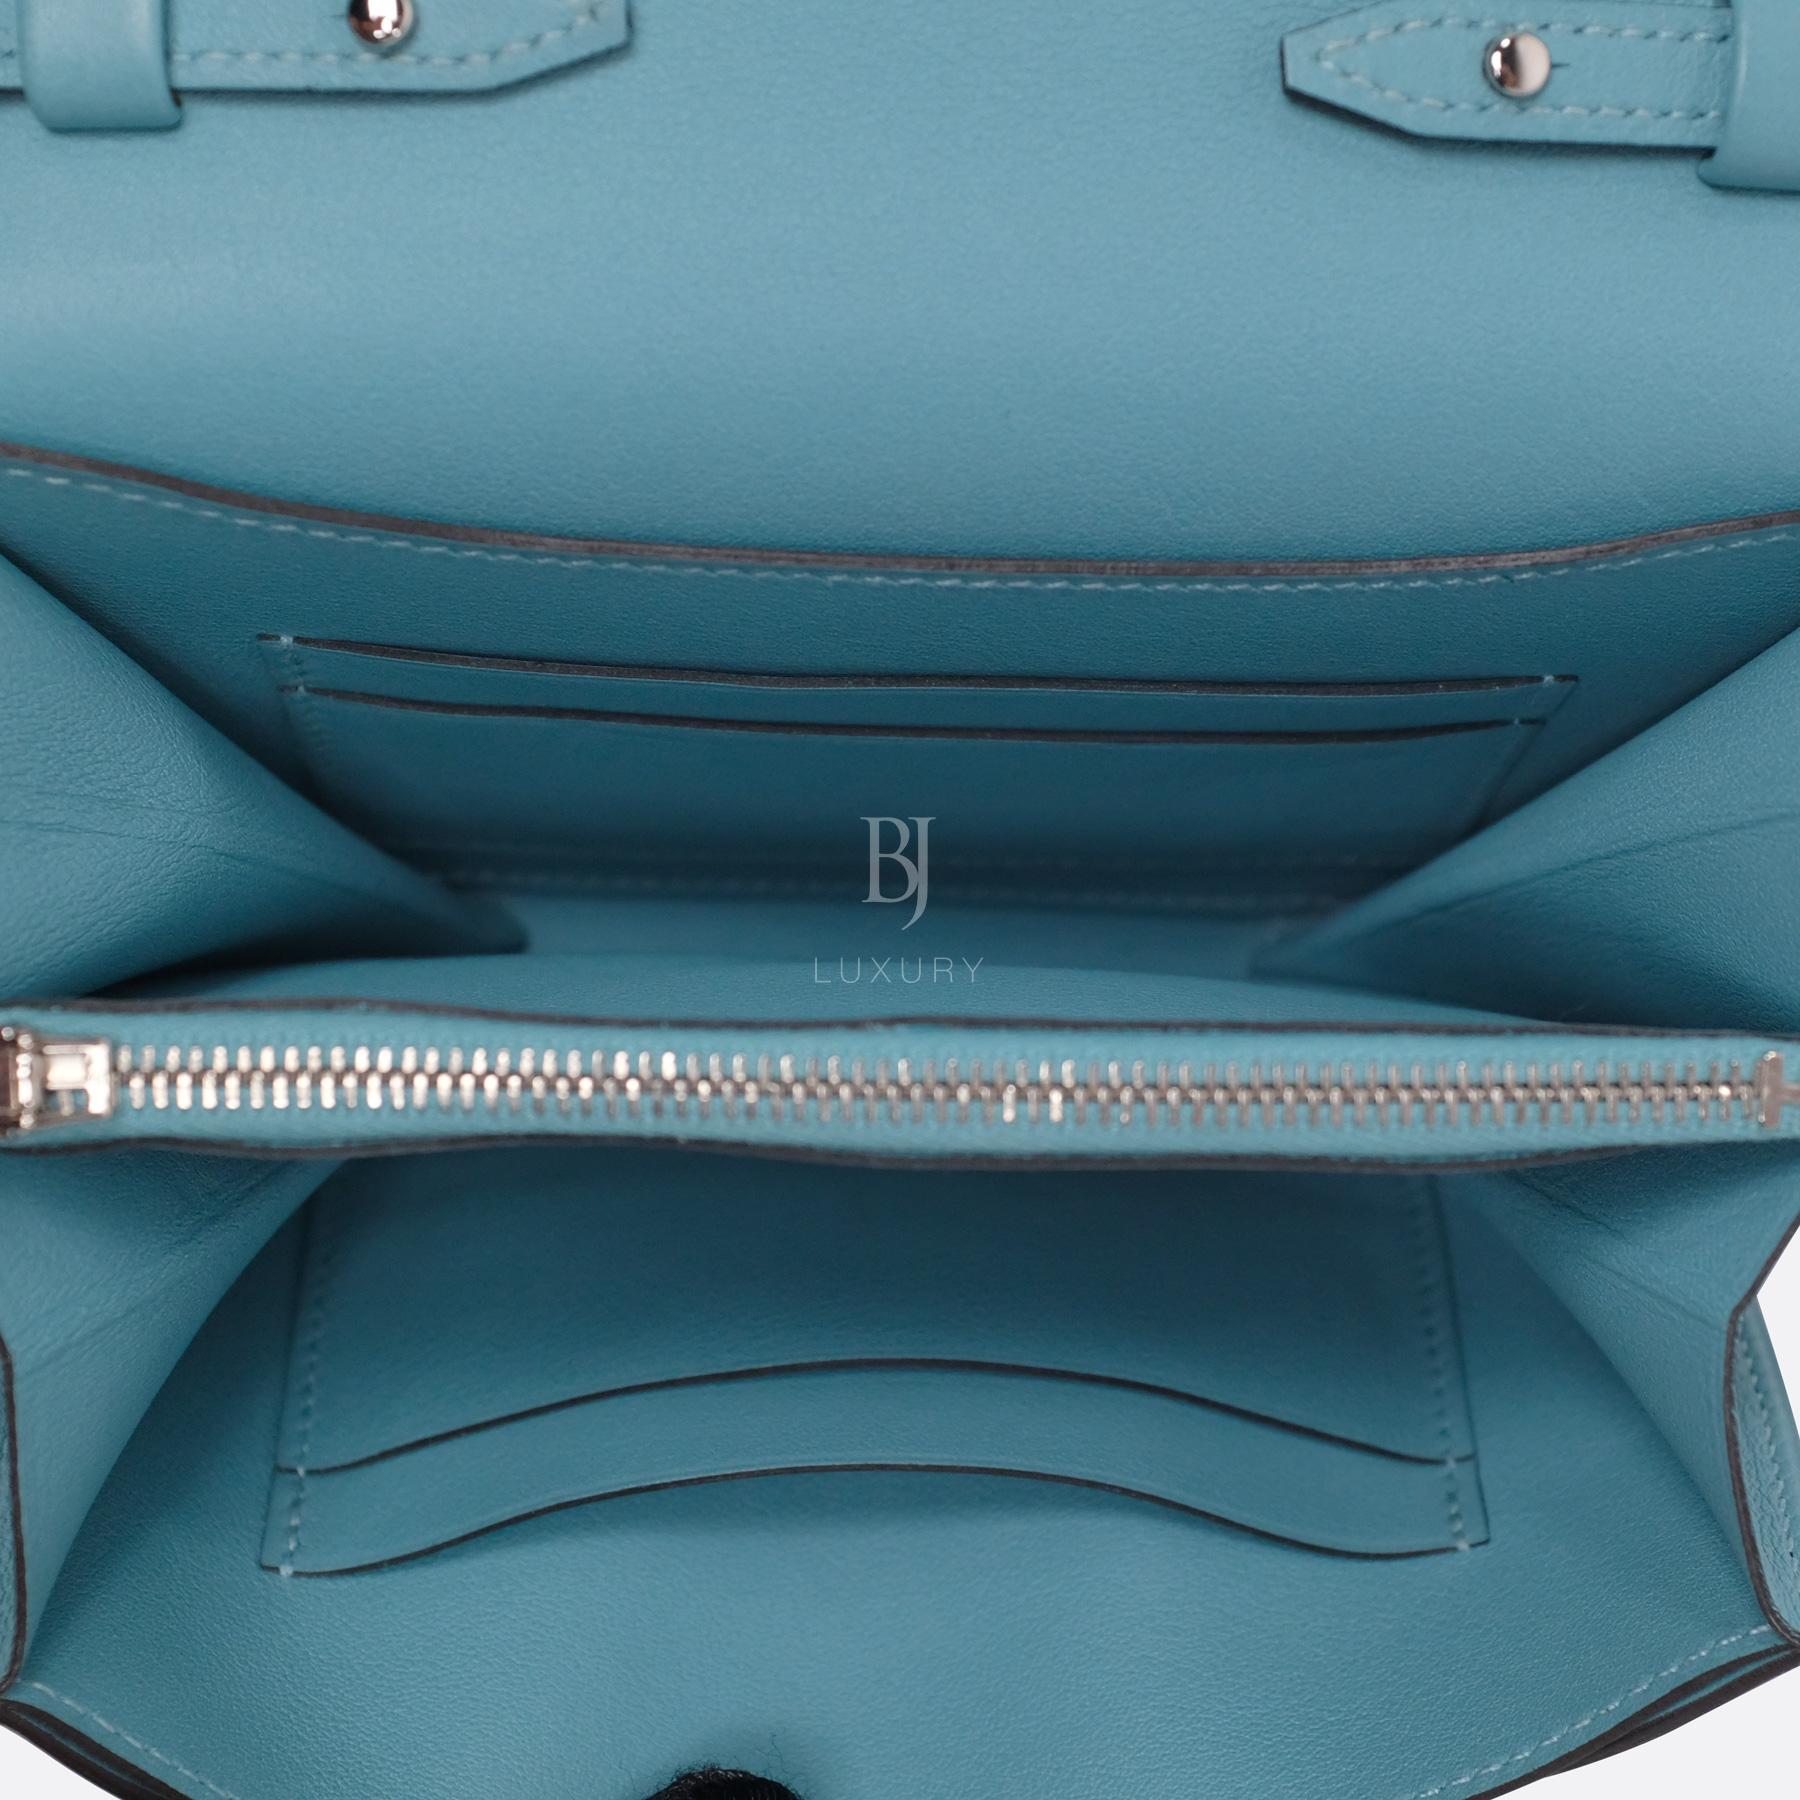 Hermes Conveyor Bag 16 Turquoise Swift Lizard Palladium BJ Luxury 16.jpg